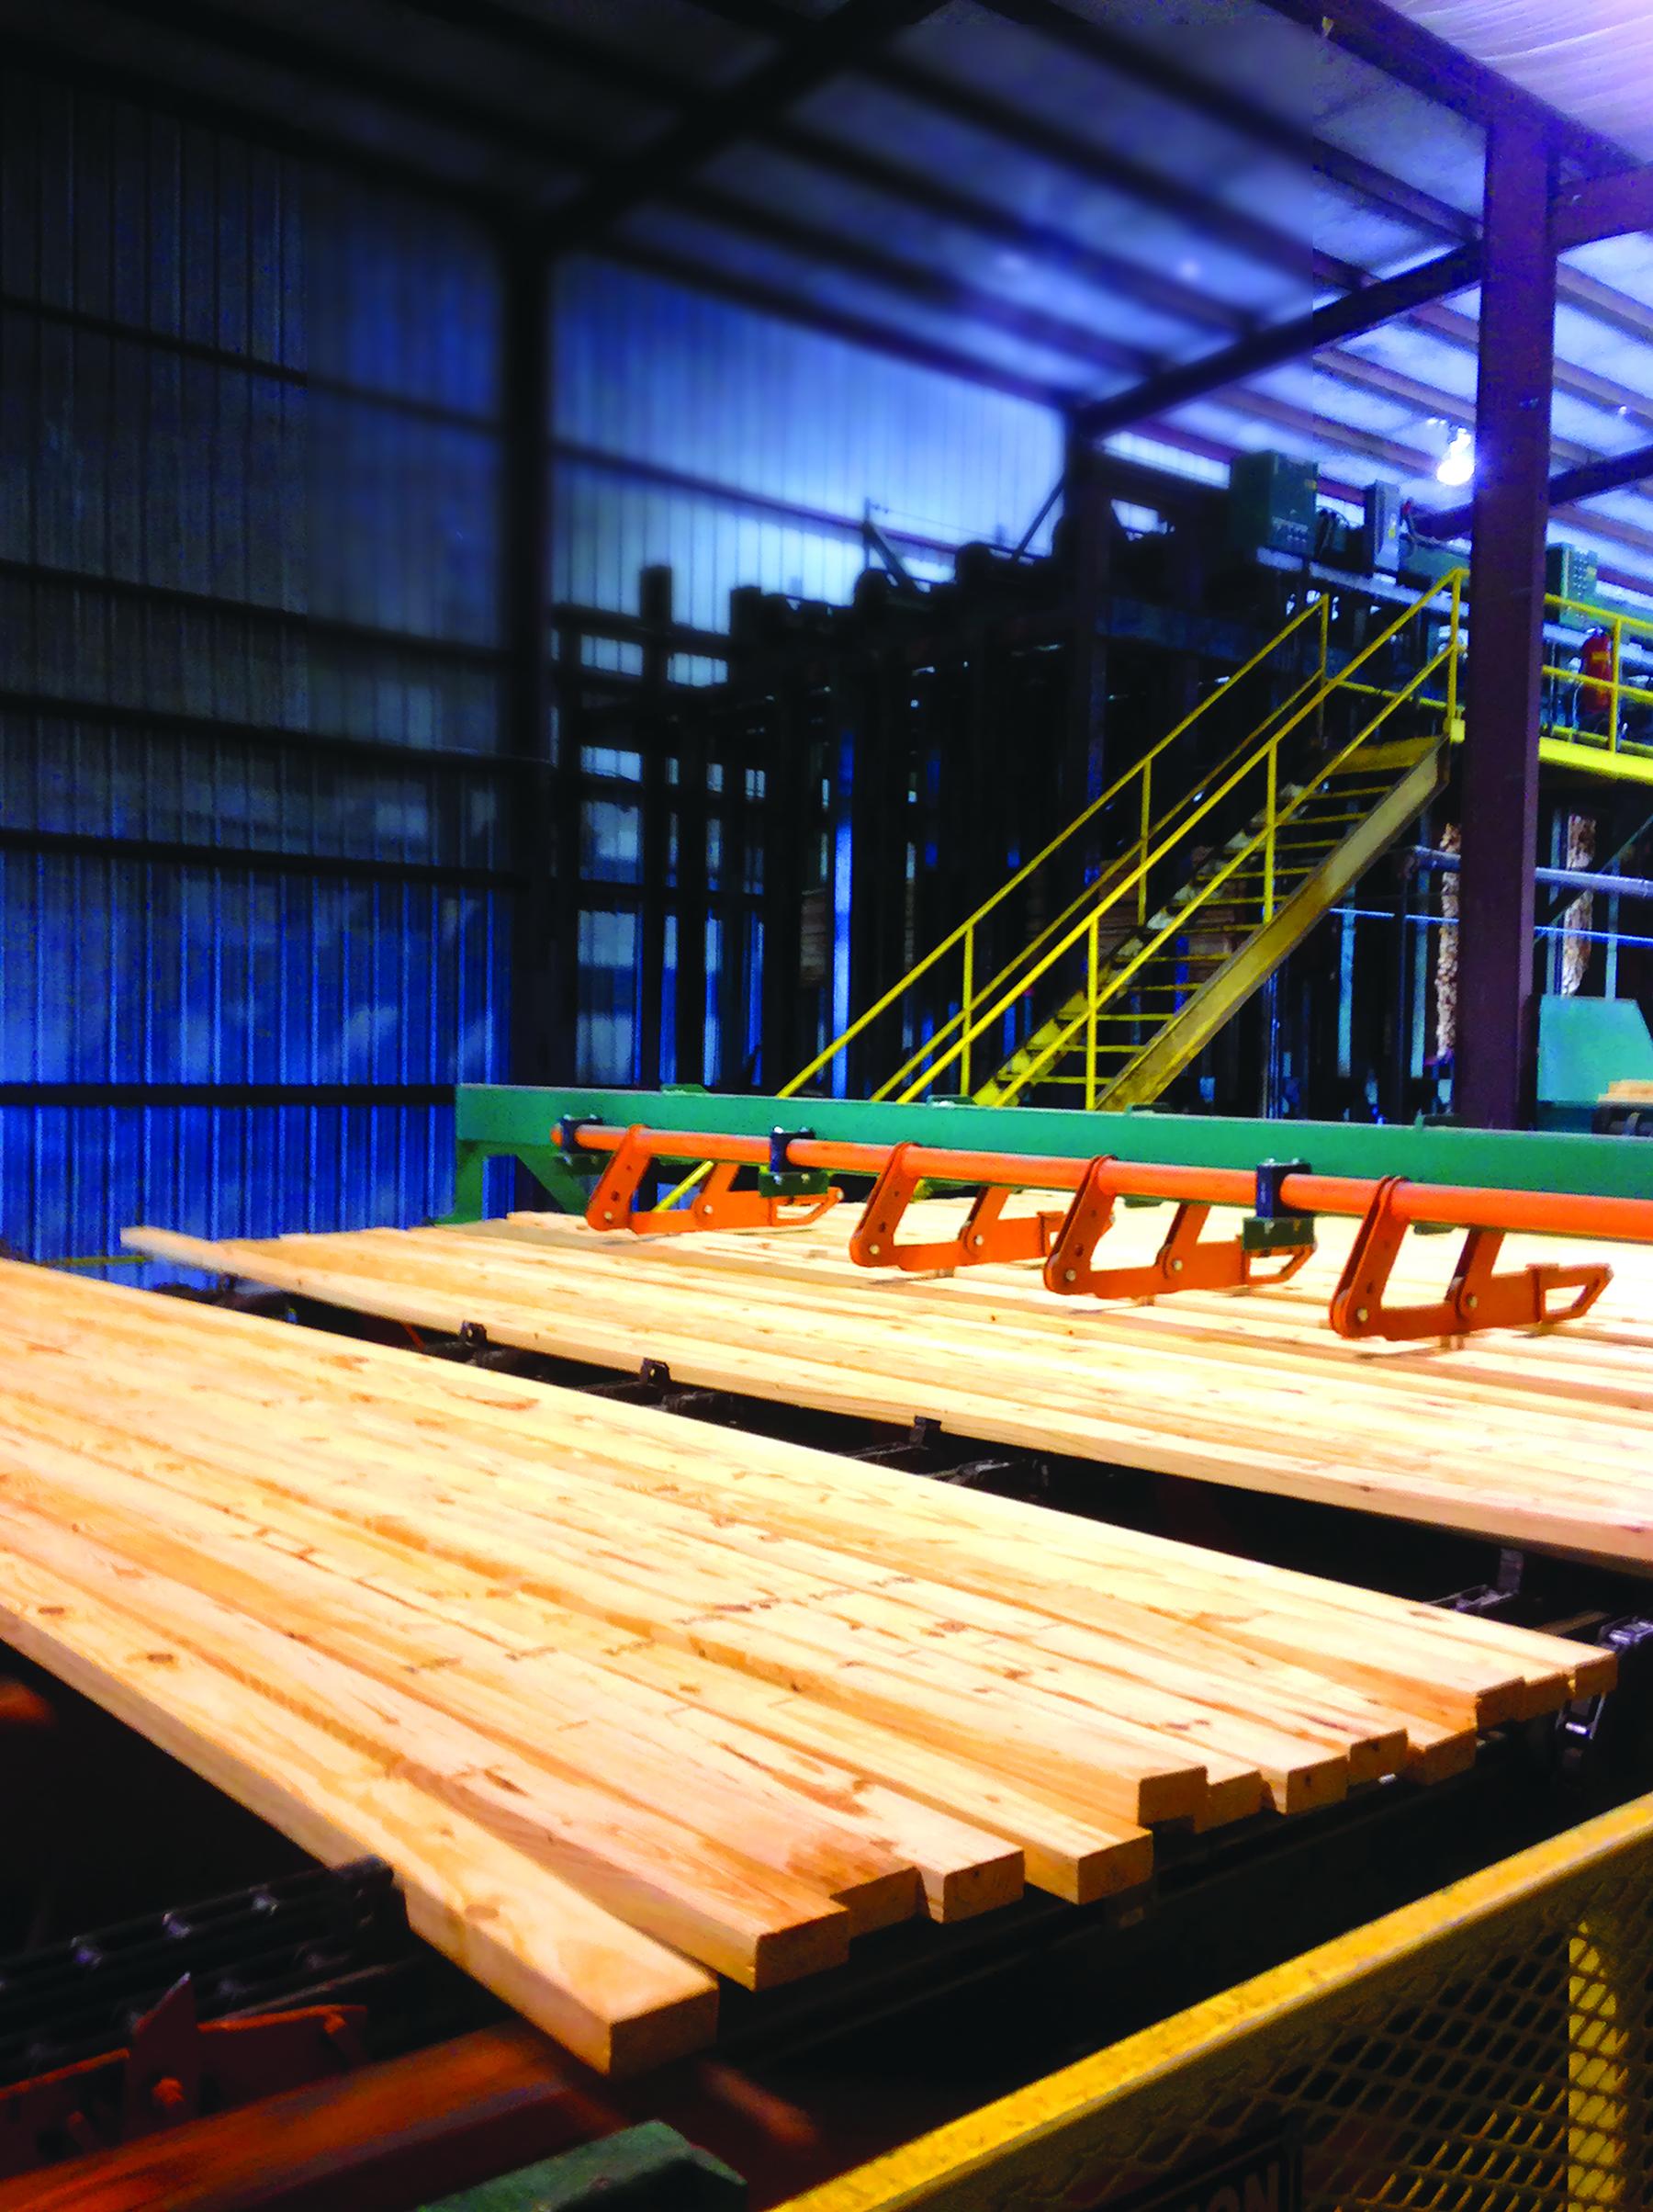 New Alabama lumber manufacturing facility will create 110 jobs